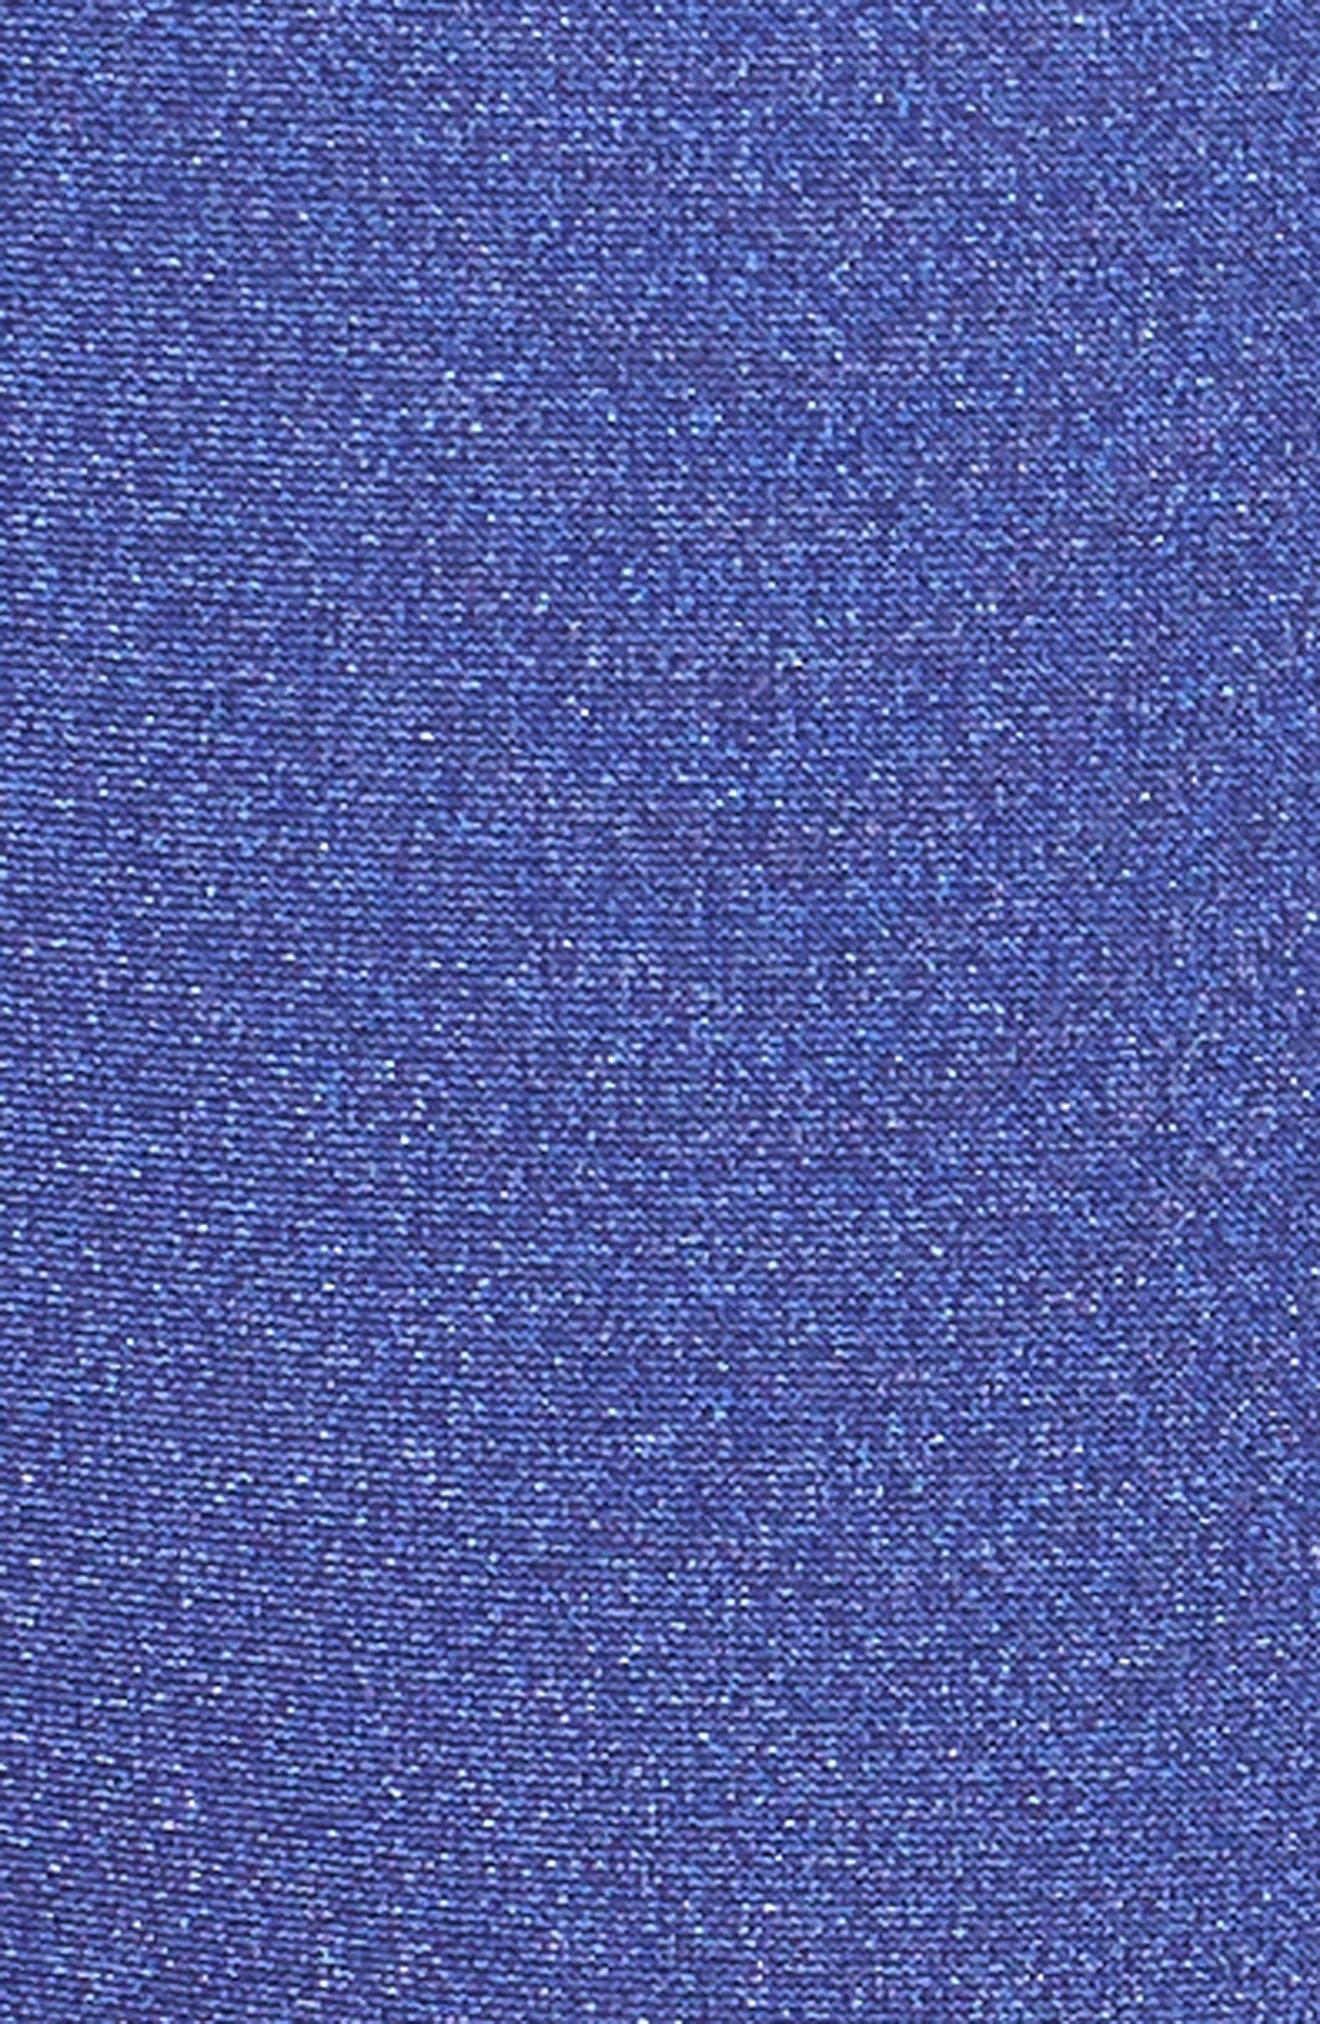 Siren Bikini Bottoms,                             Alternate thumbnail 5, color,                             BLUE TOPAZ